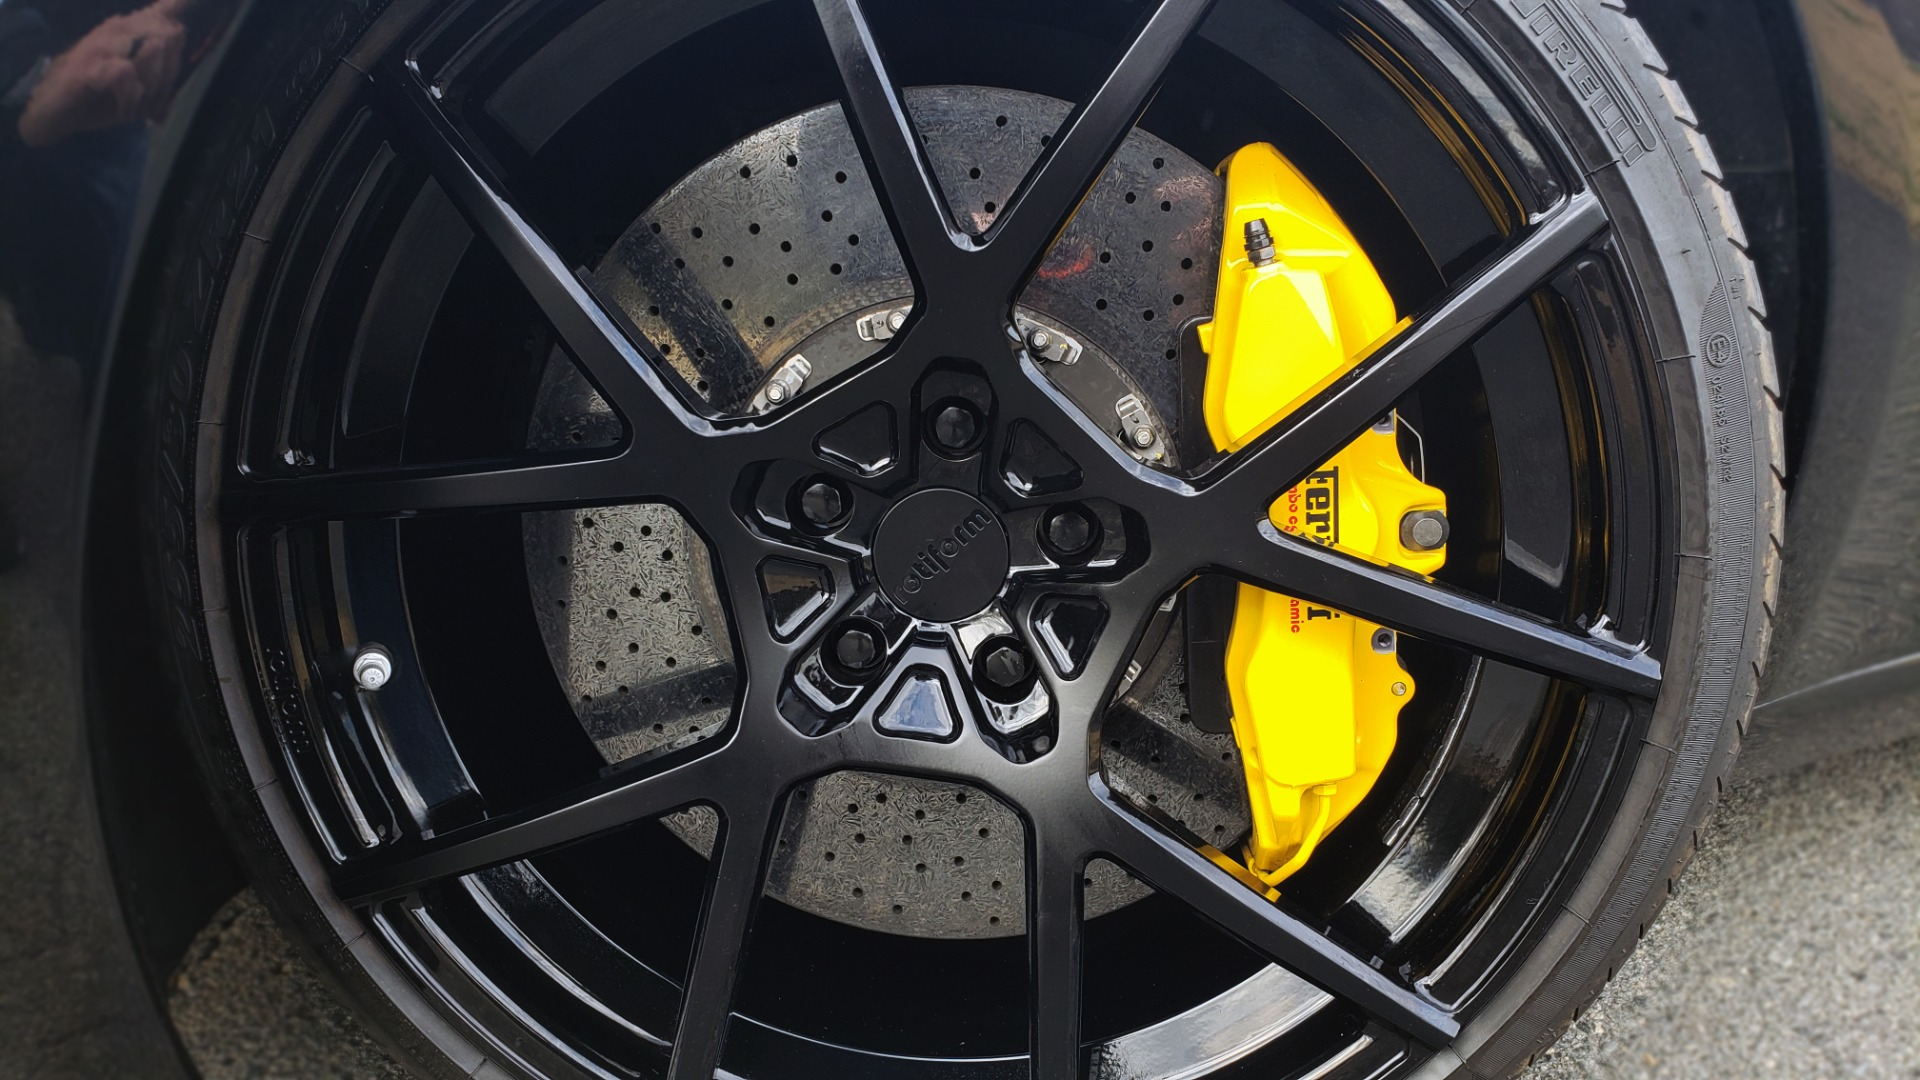 Used 2007 Ferrari 599 GTB FIORANO HGTE / V12 / F1 TRANS / NAV / BOSE / CUSTOM WHEELS for sale $109,999 at Formula Imports in Charlotte NC 28227 31